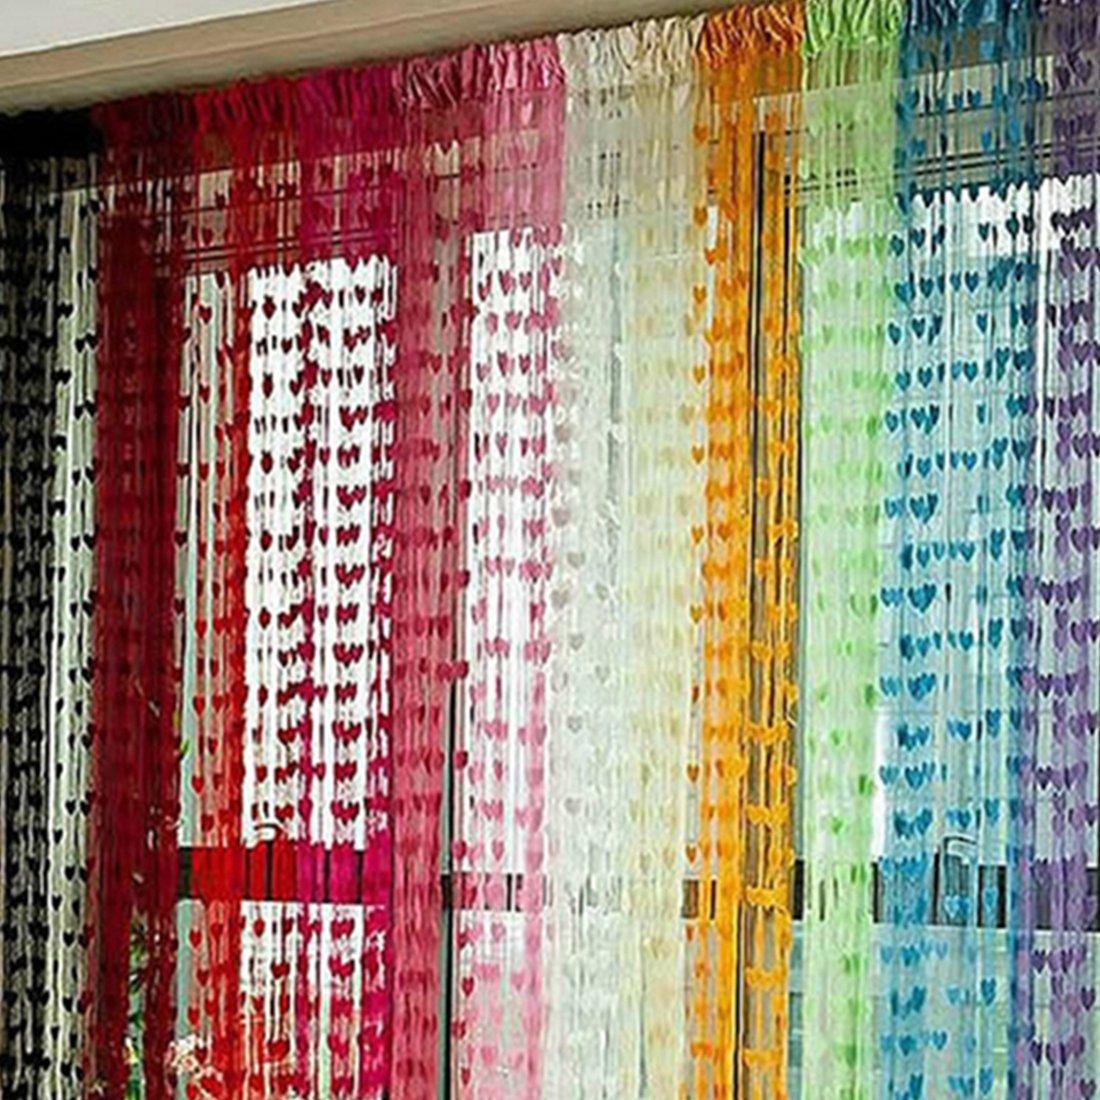 Dise/ño de l/ínea de coraz/ón borla cadena cortina de ventana Fashion rom/ántico decorativo sala de estar cortina de puerta Grass Green Medium